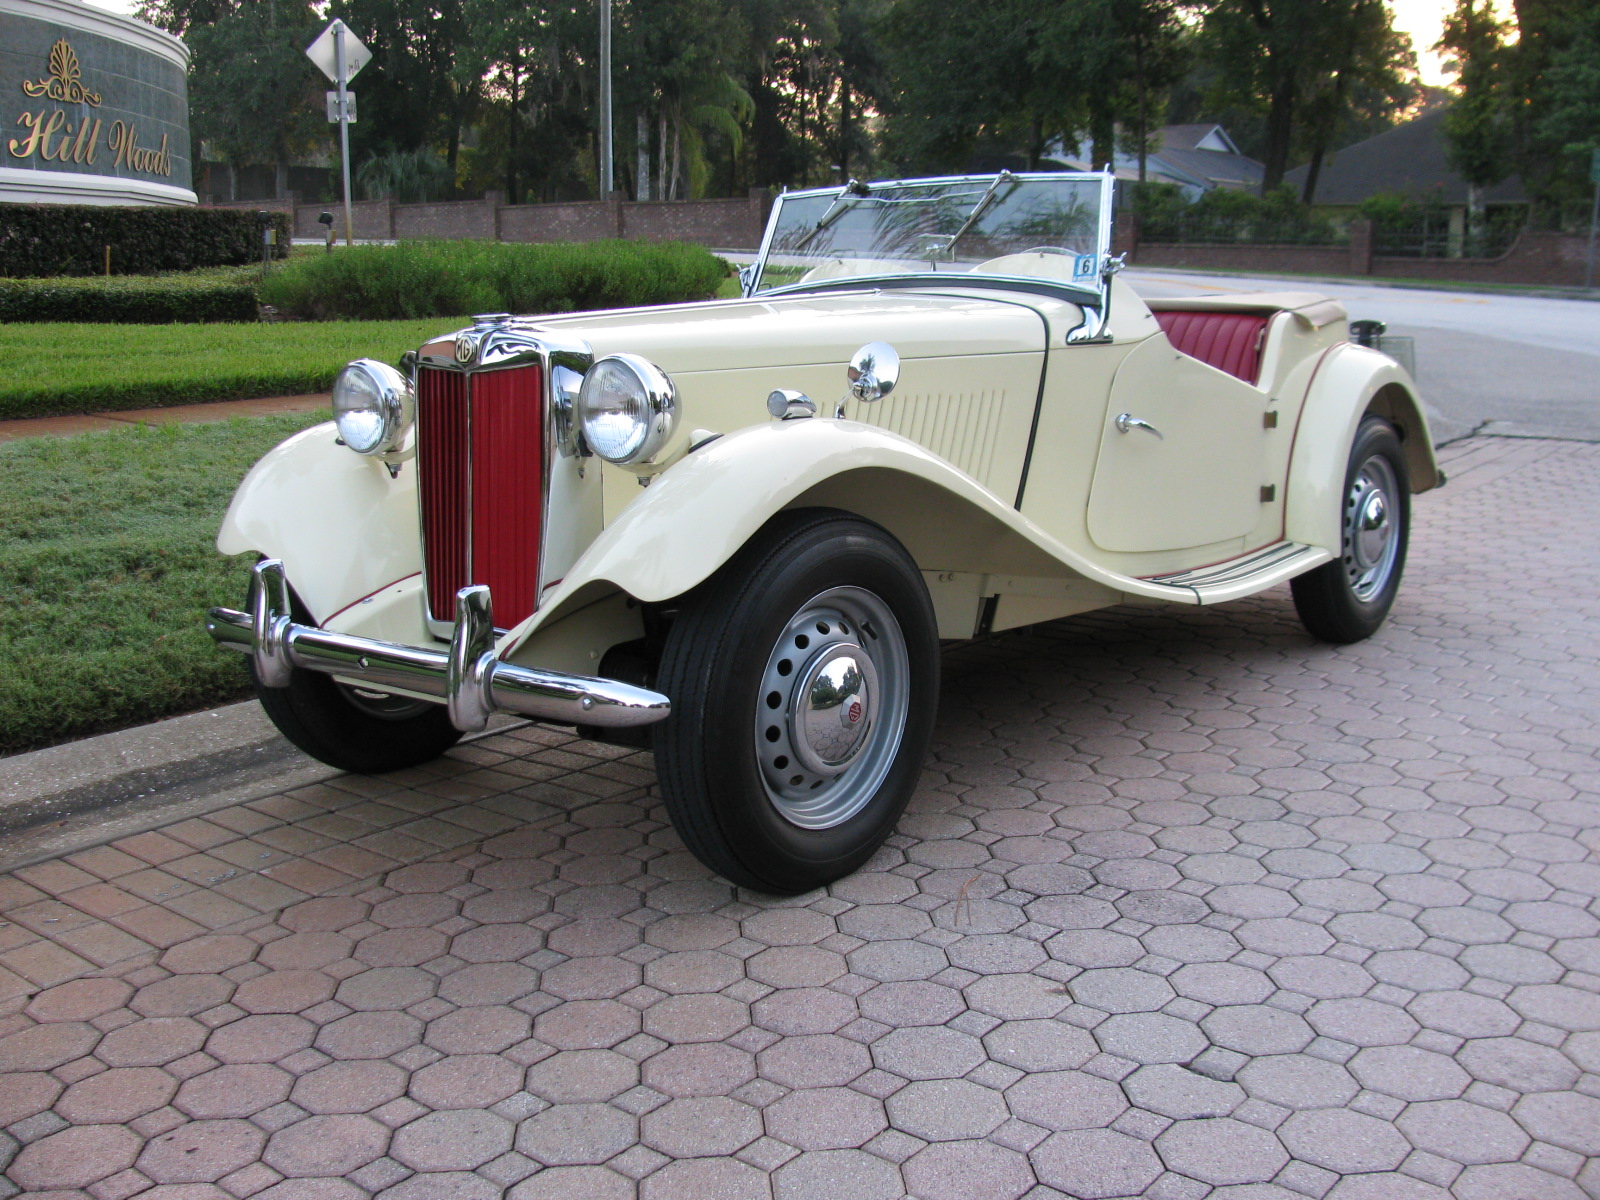 New England Classics - Classic Cars, MG, Austin Healey